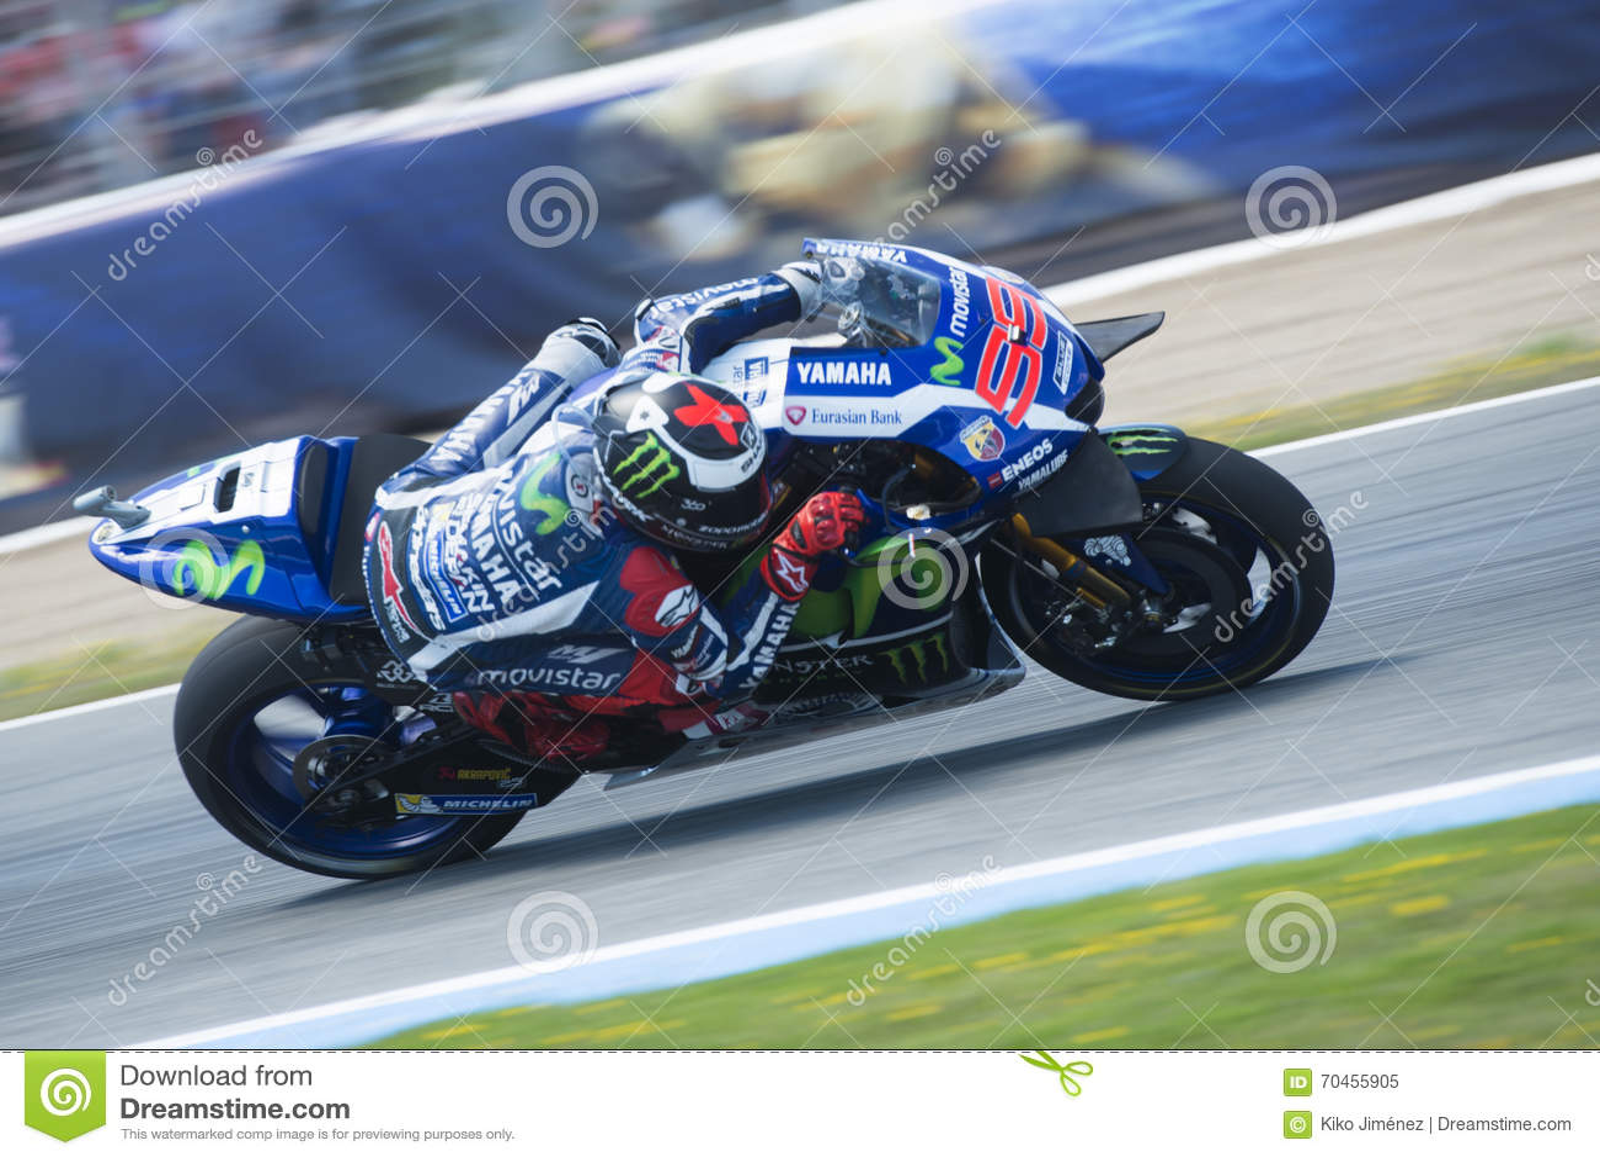 MotoGP Spain, In Jerez Editorial Image - Image: 70455905